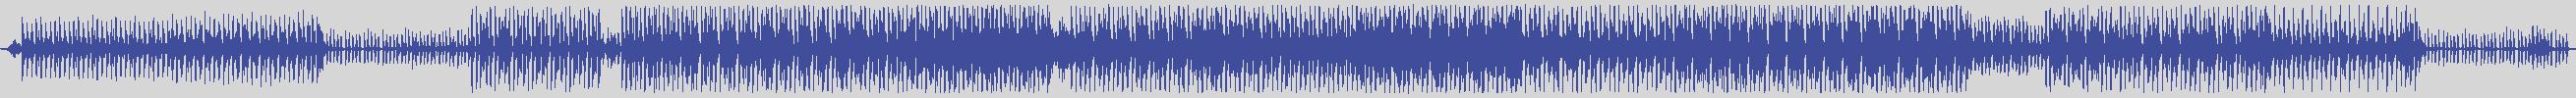 muzik_without_control [MWC001] Jt Company - Love Tende [Dub Version] audio wave form